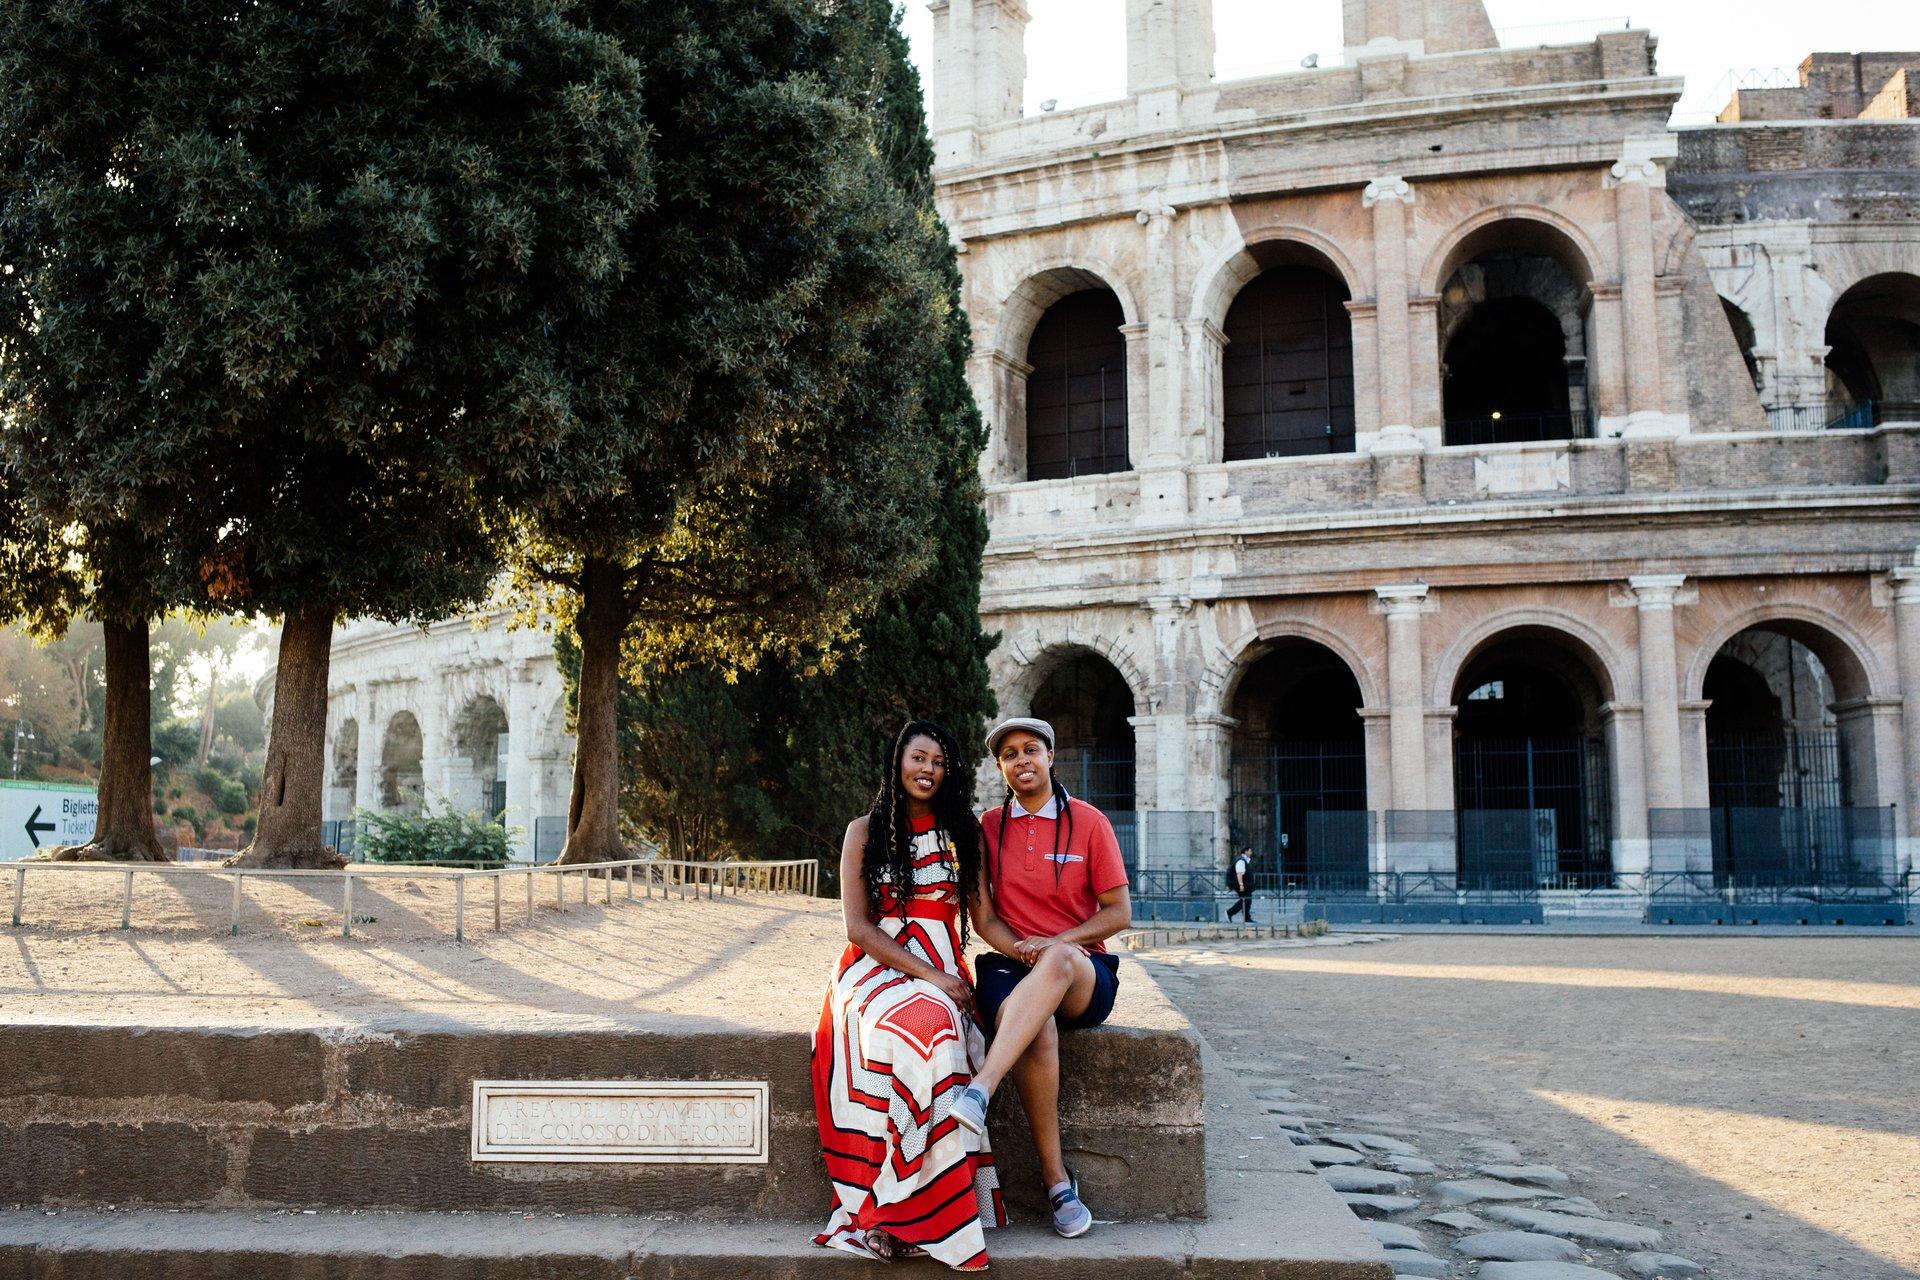 Rome-Italy-travel-story-Flytographer-41